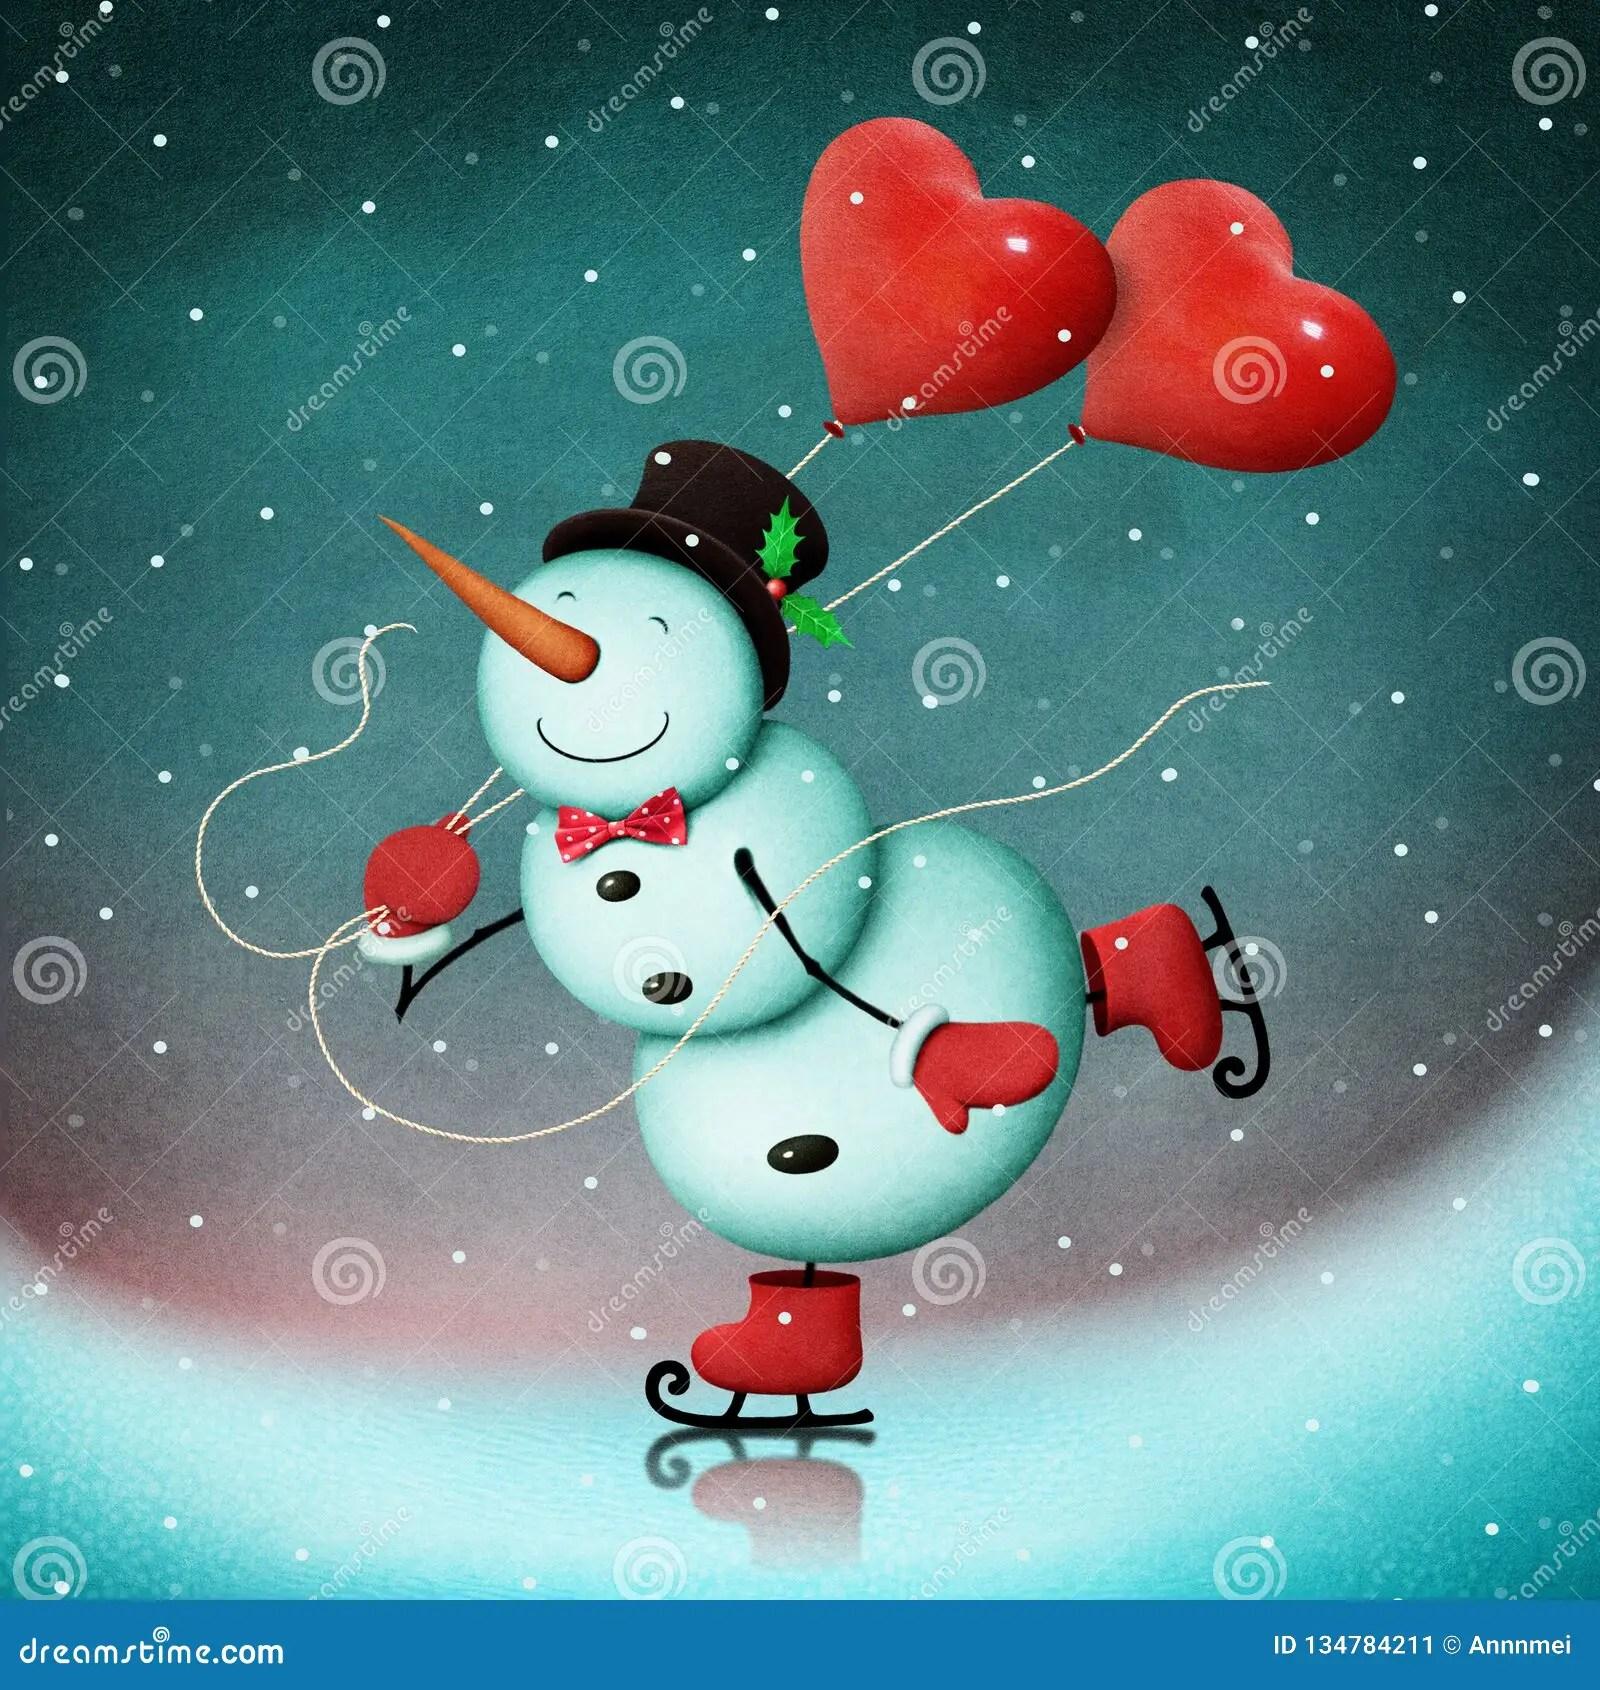 Snowman On Ice With Hearts Stock Illustration